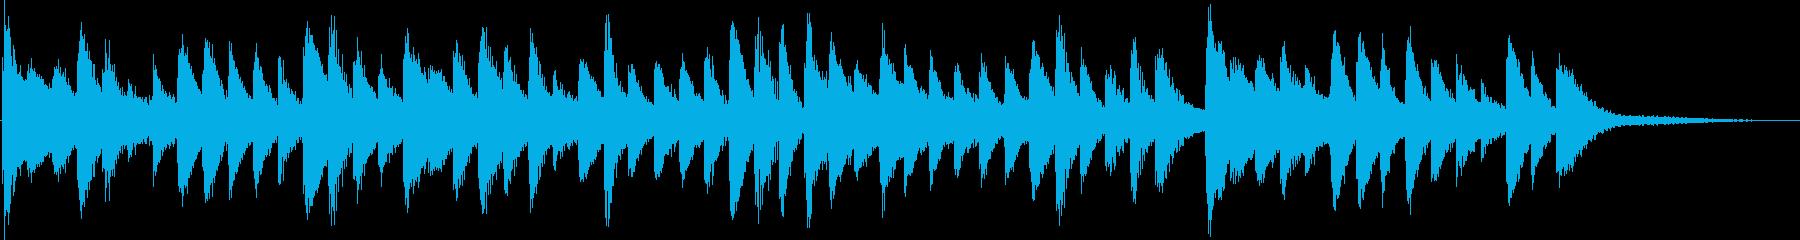 Refreshing and refreshing healing jingle's reproduced waveform